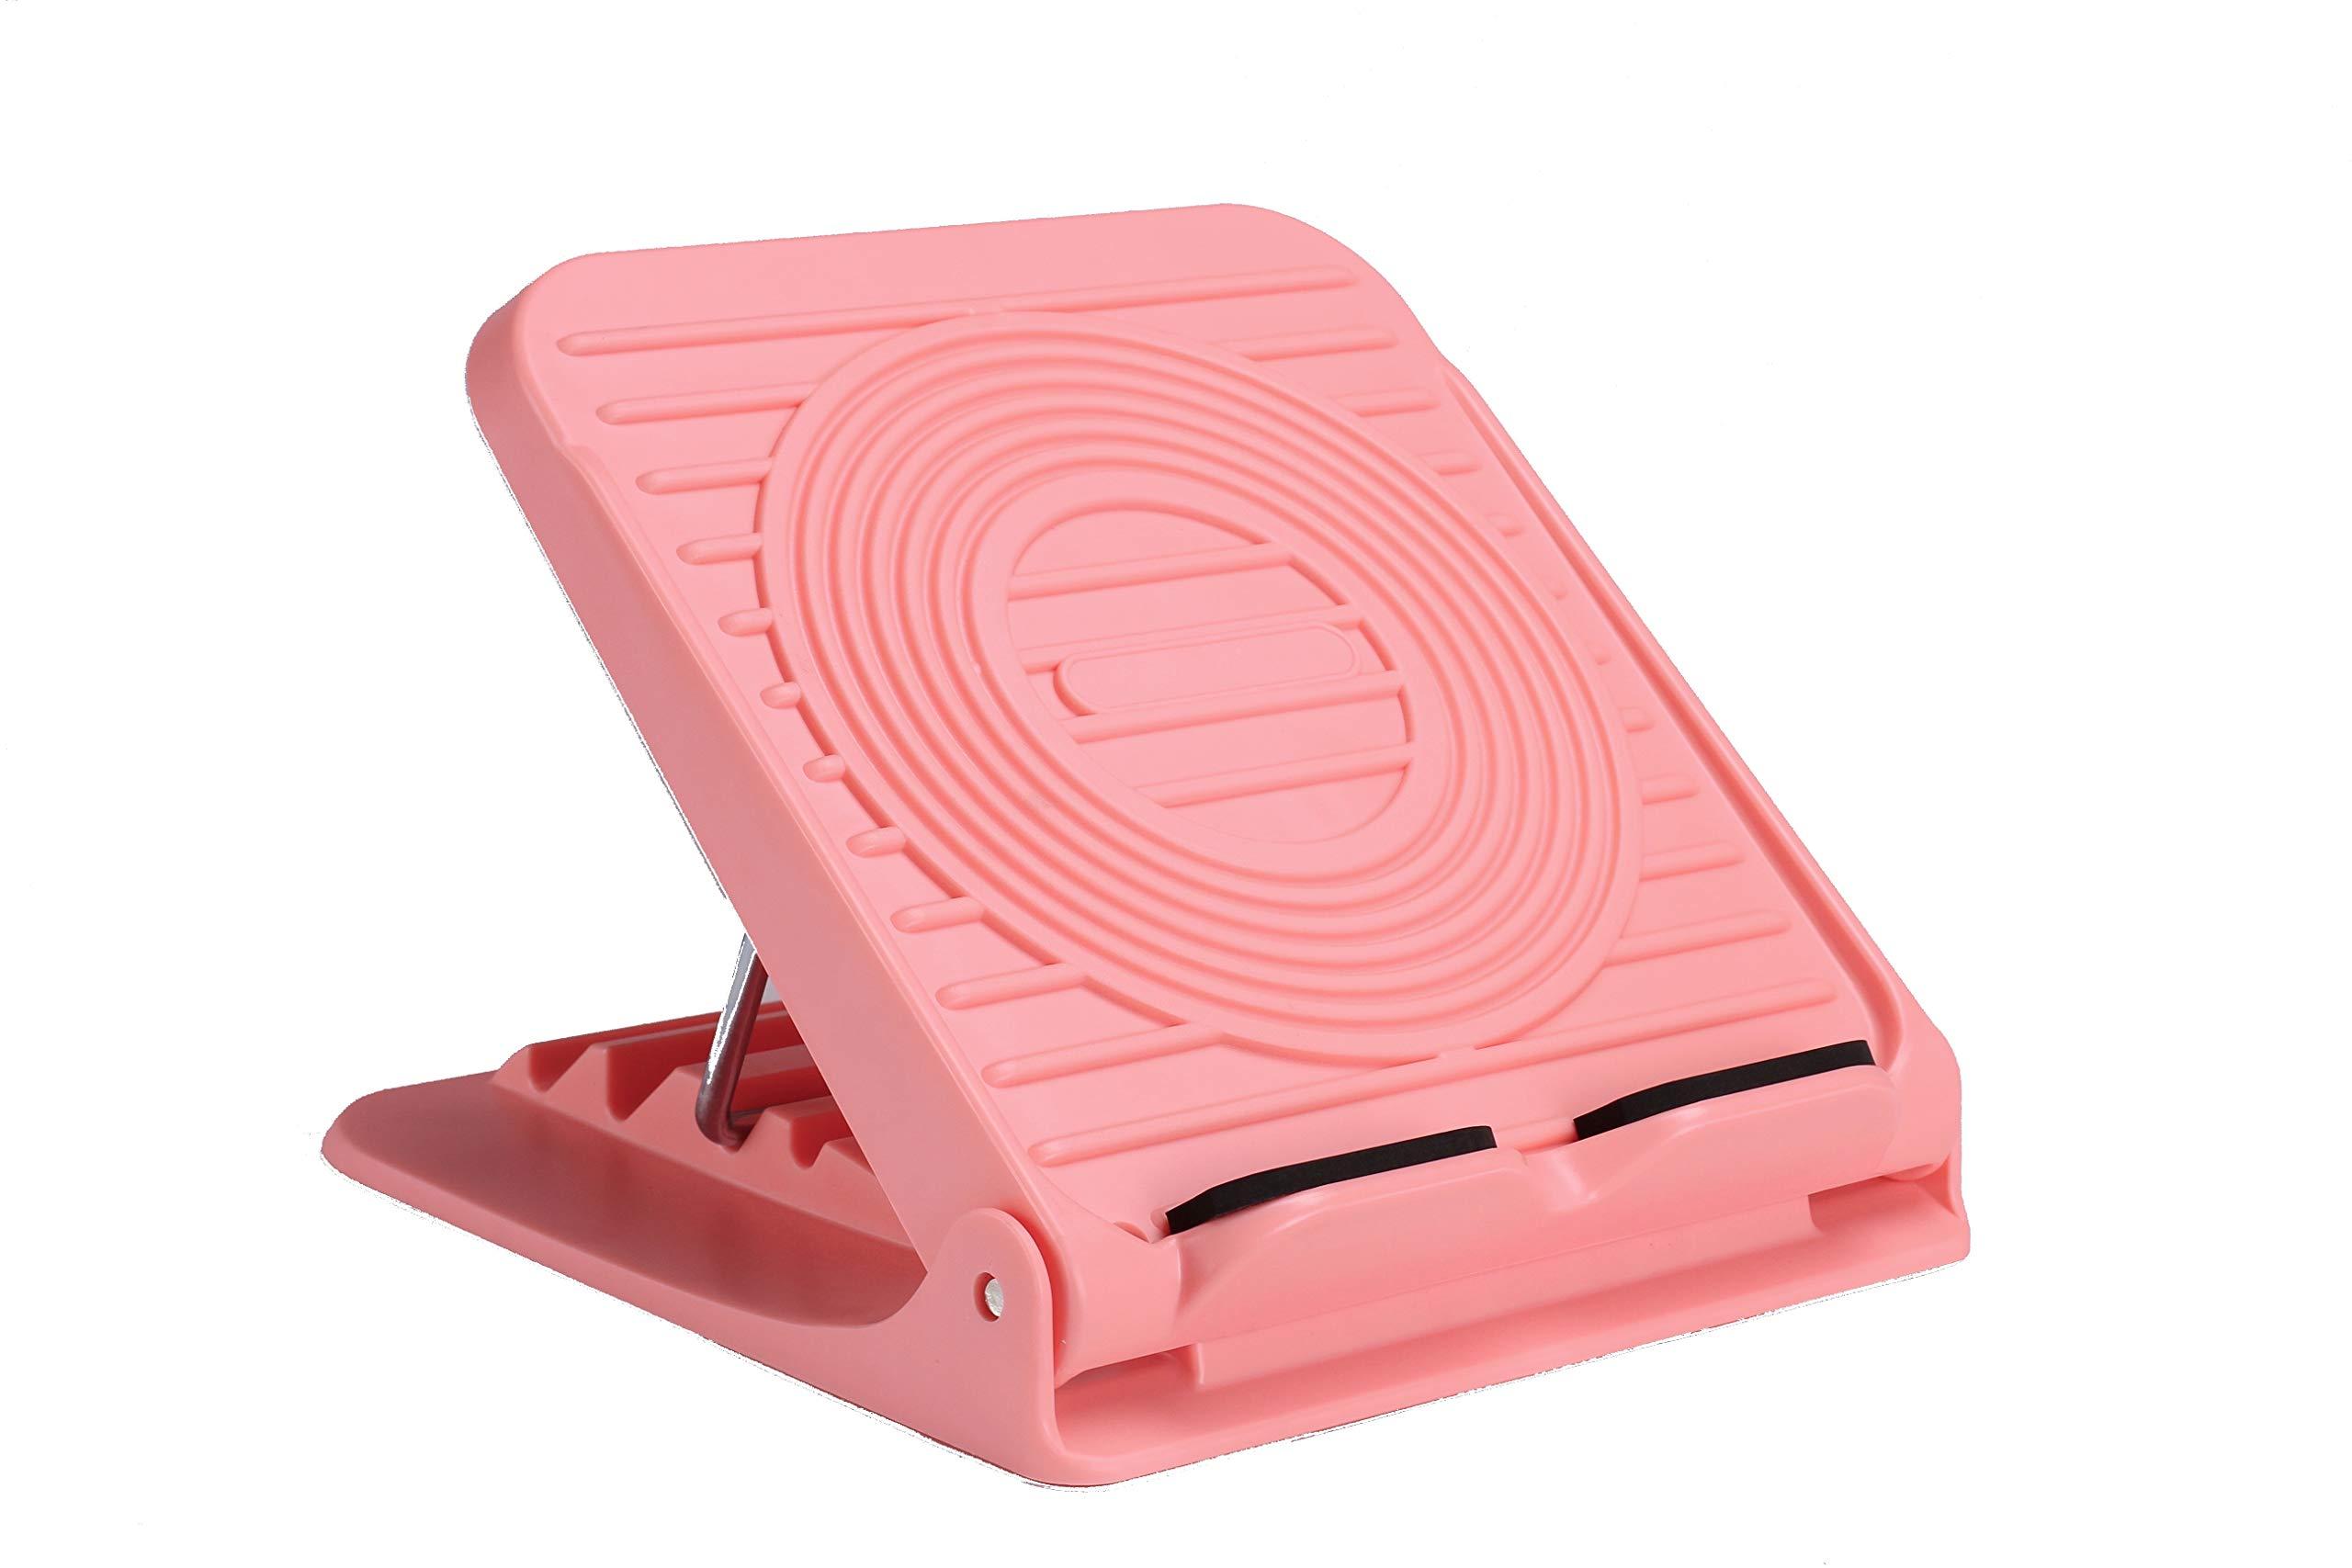 LOVHO Adjustable Slant Board Sports Equipment Leg Exercise Ankle Calf Stretcher Foot Balancing Board (Pink)